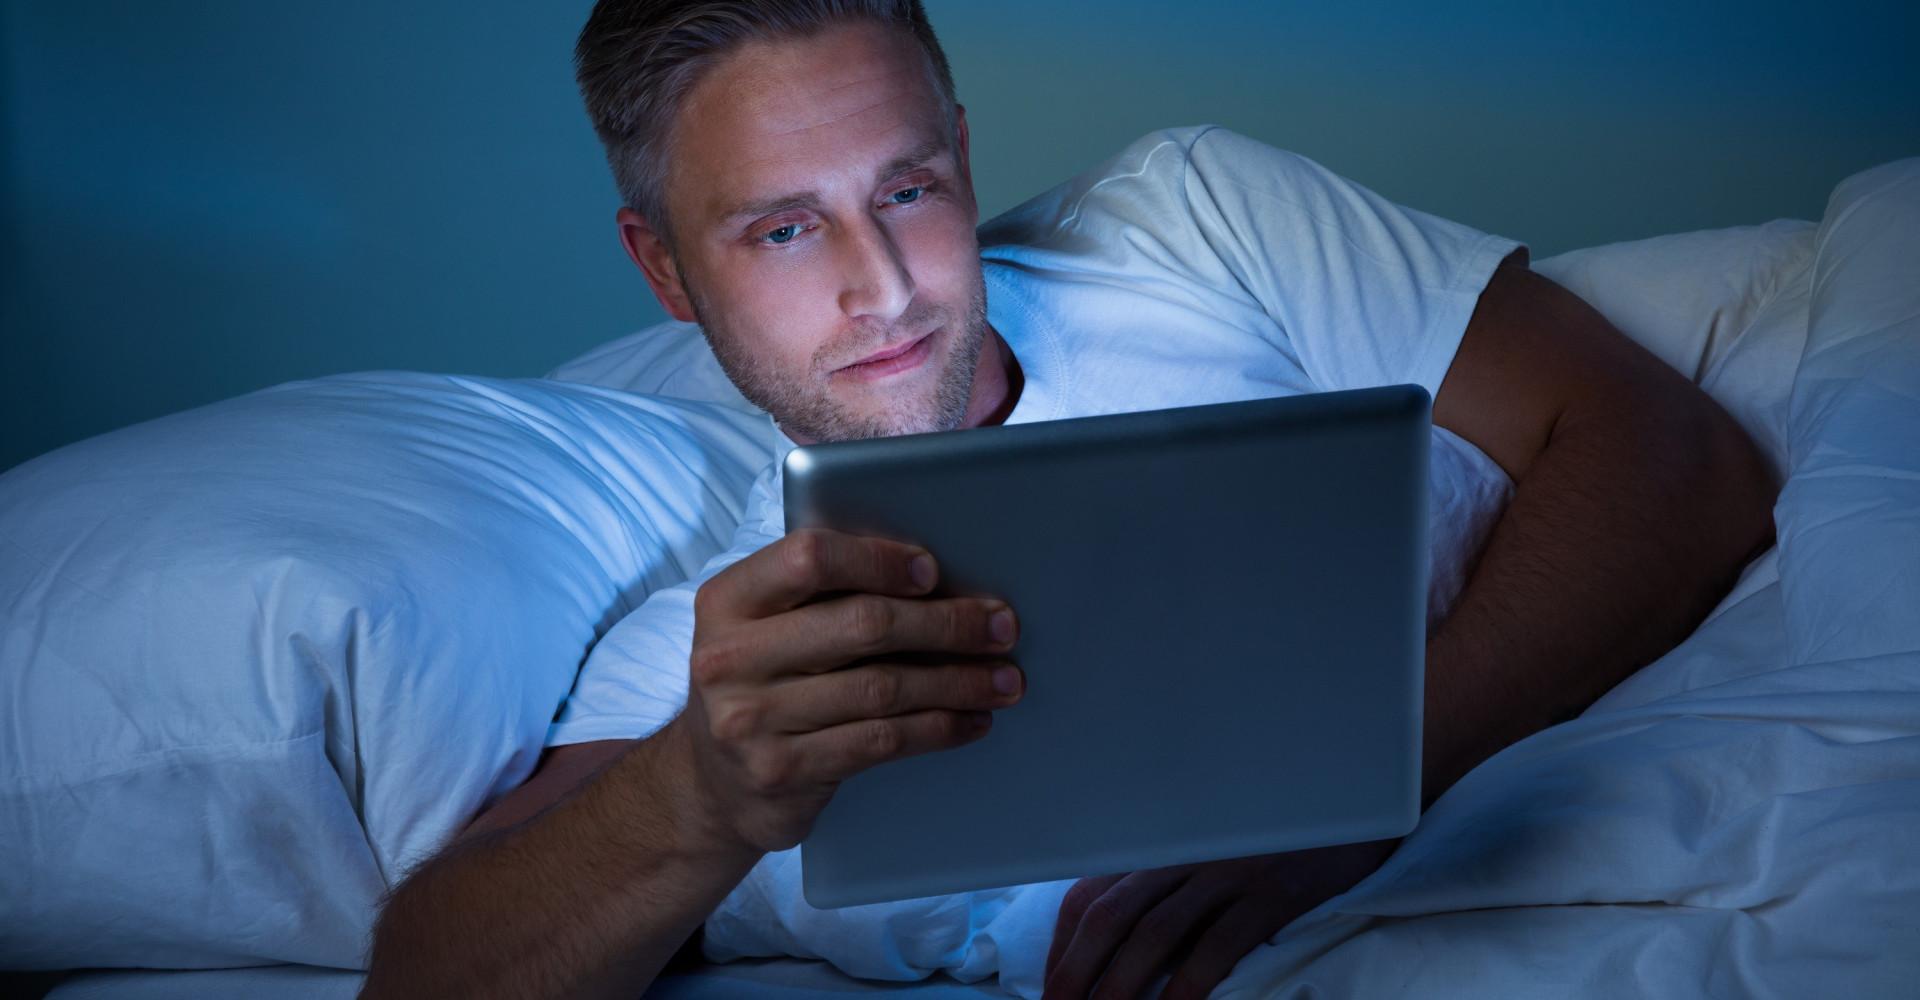 Tabletgebruik in de avond verpest je slaap